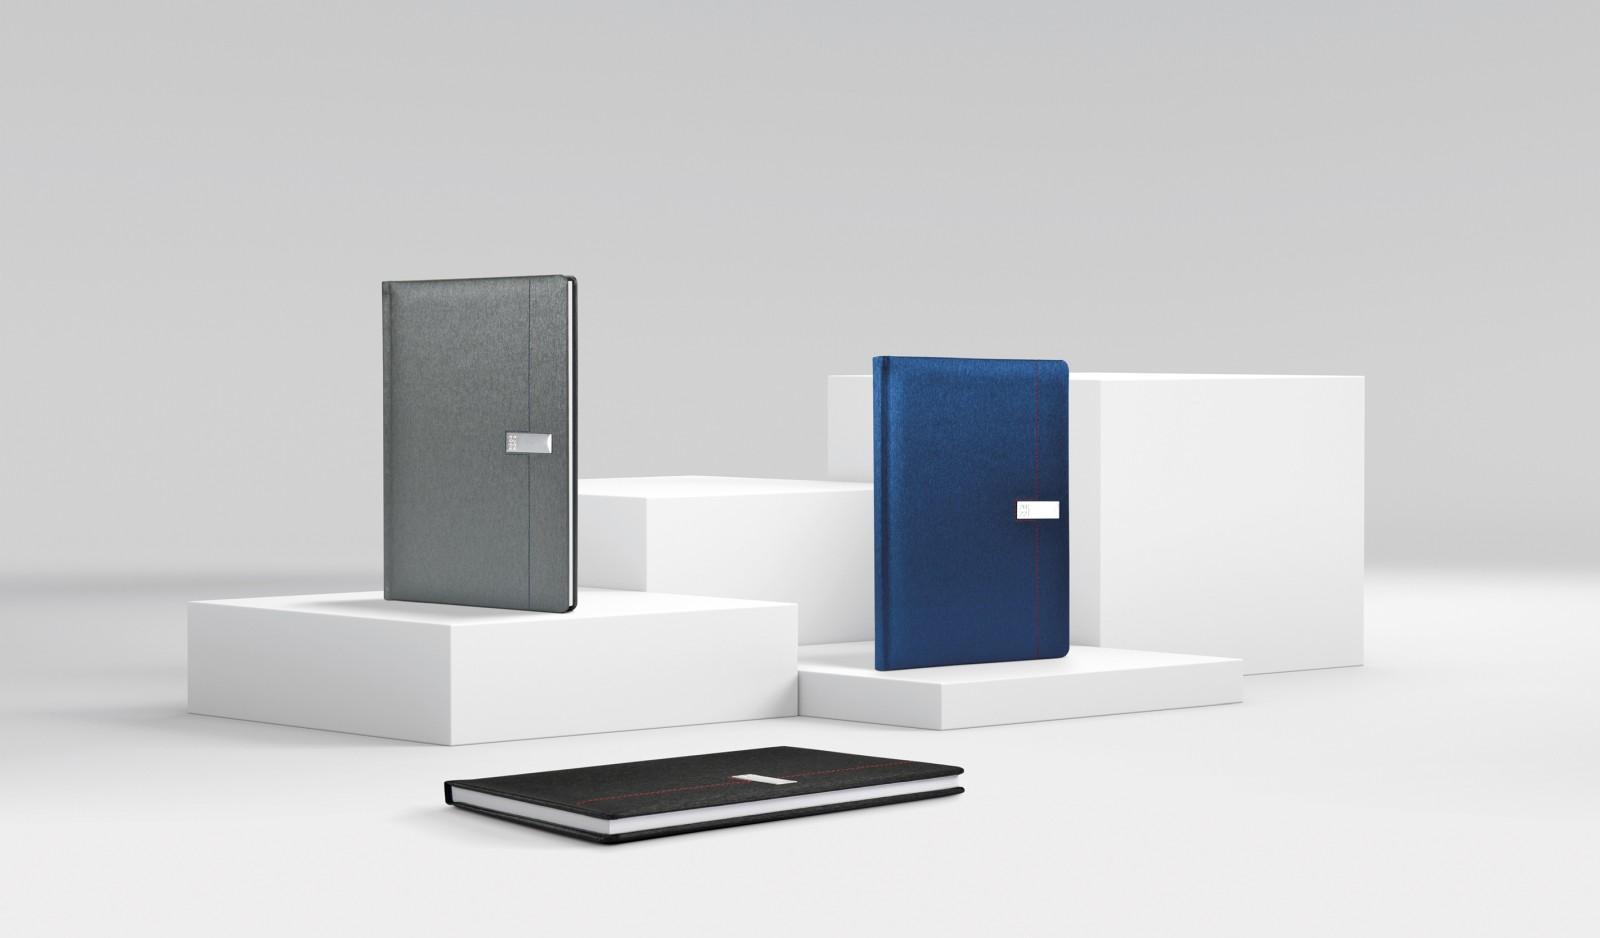 Cube Pedestal Template. Studio Scene For Product Display. 3D rendering